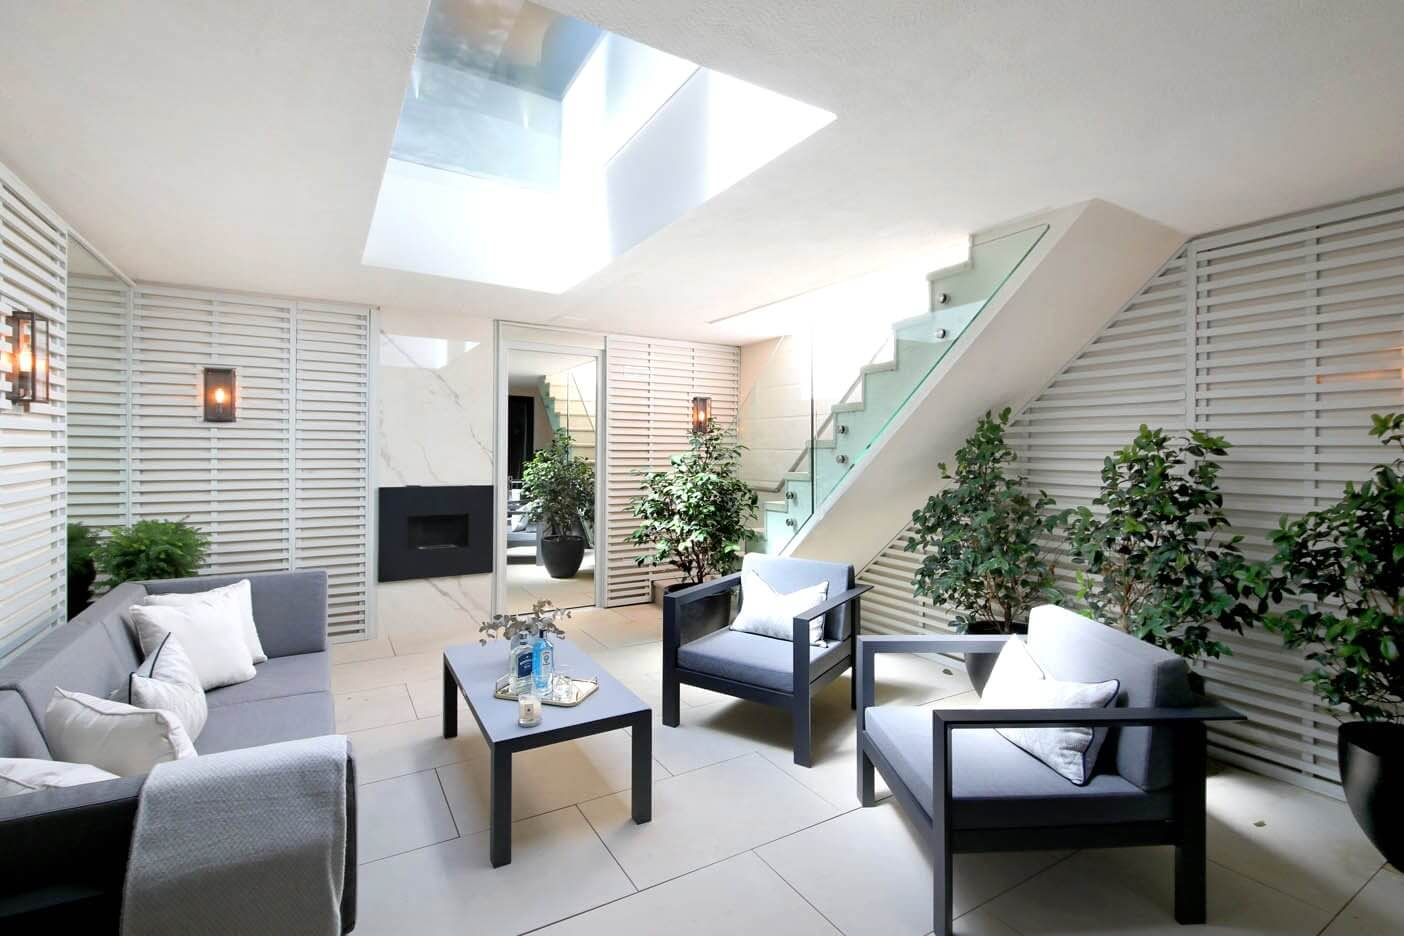 under-garden-basement